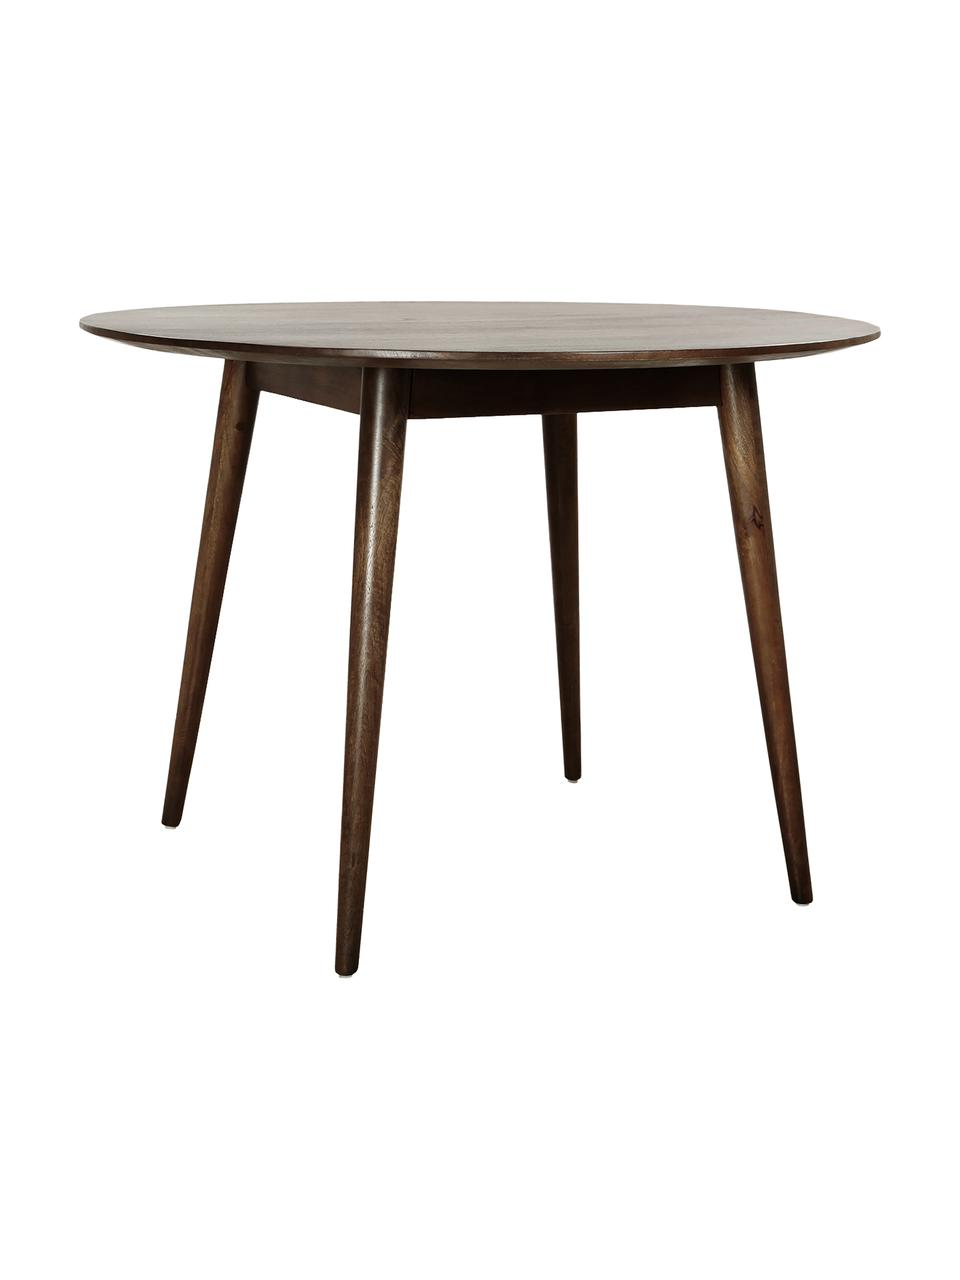 Table ronde en bois massif Oscar, Brun foncé